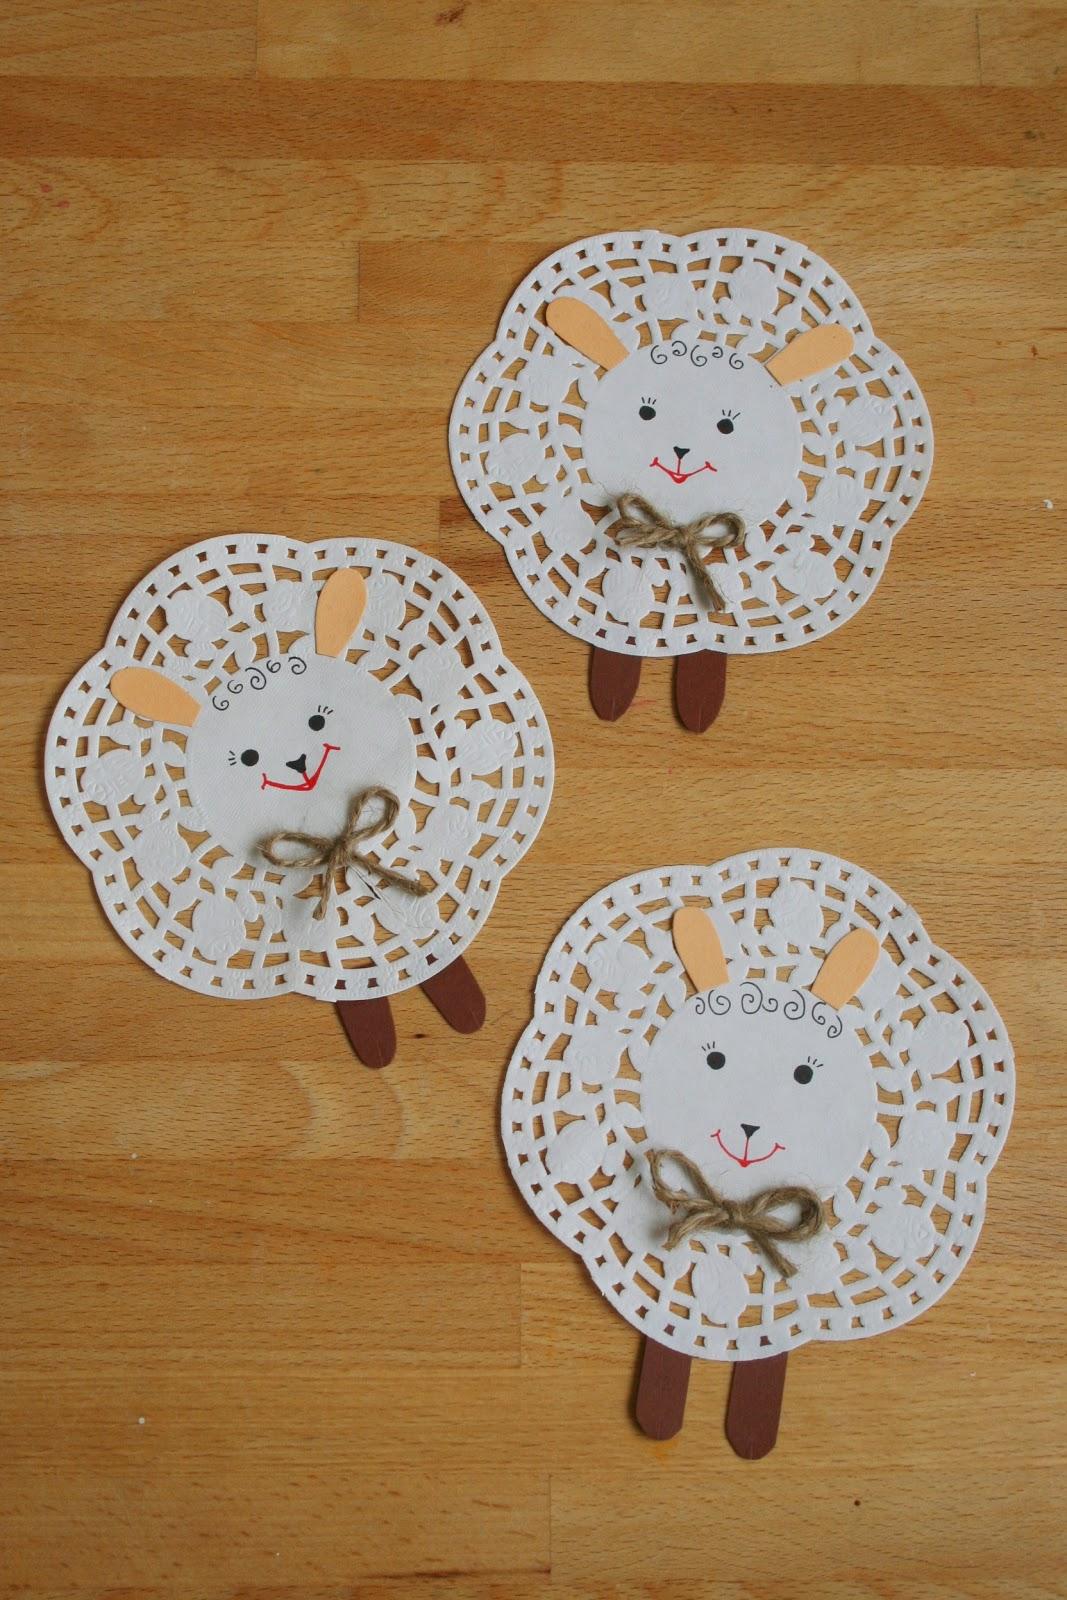 Kifli s levendula tortapap r b r nyk k for Manualidades decoracion infantil